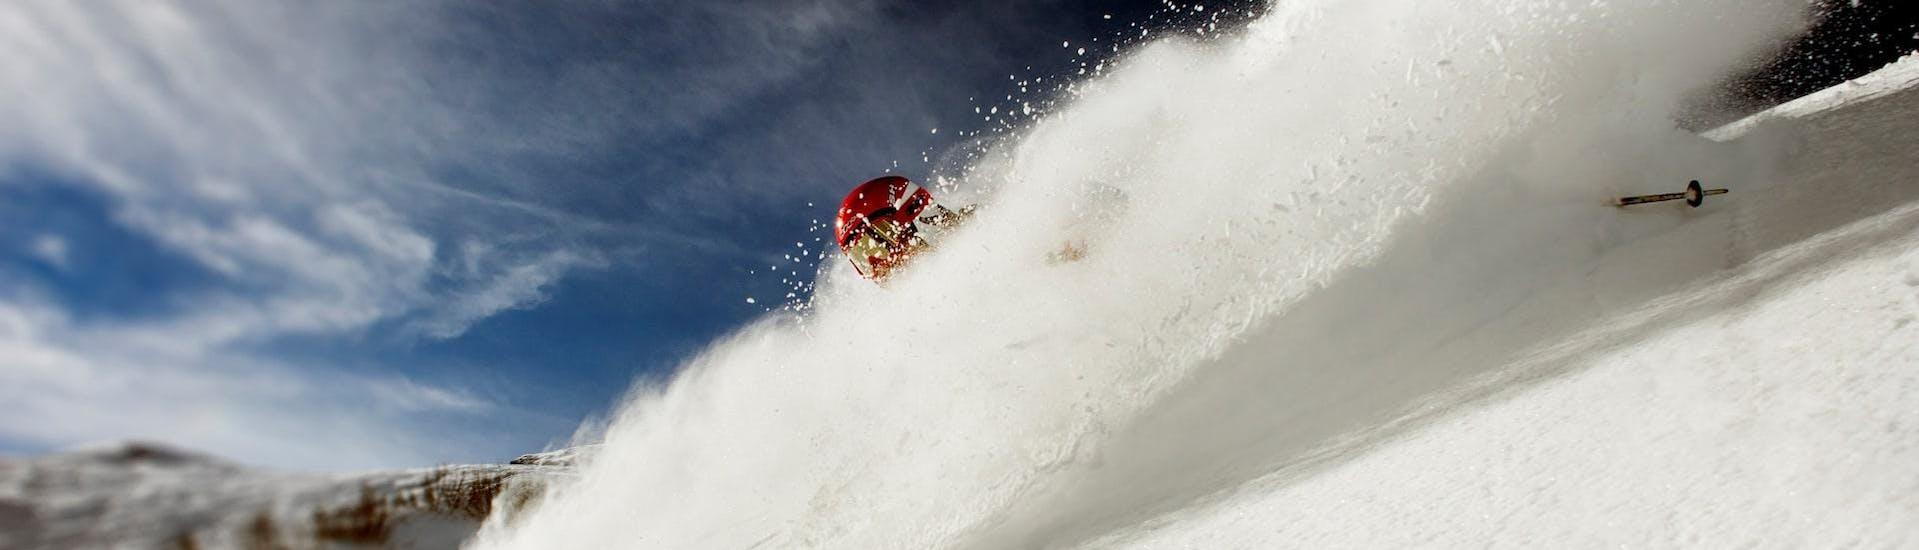 Freeride Private - Advanced avec Skischule Gaschurn-Partenen - Hero image